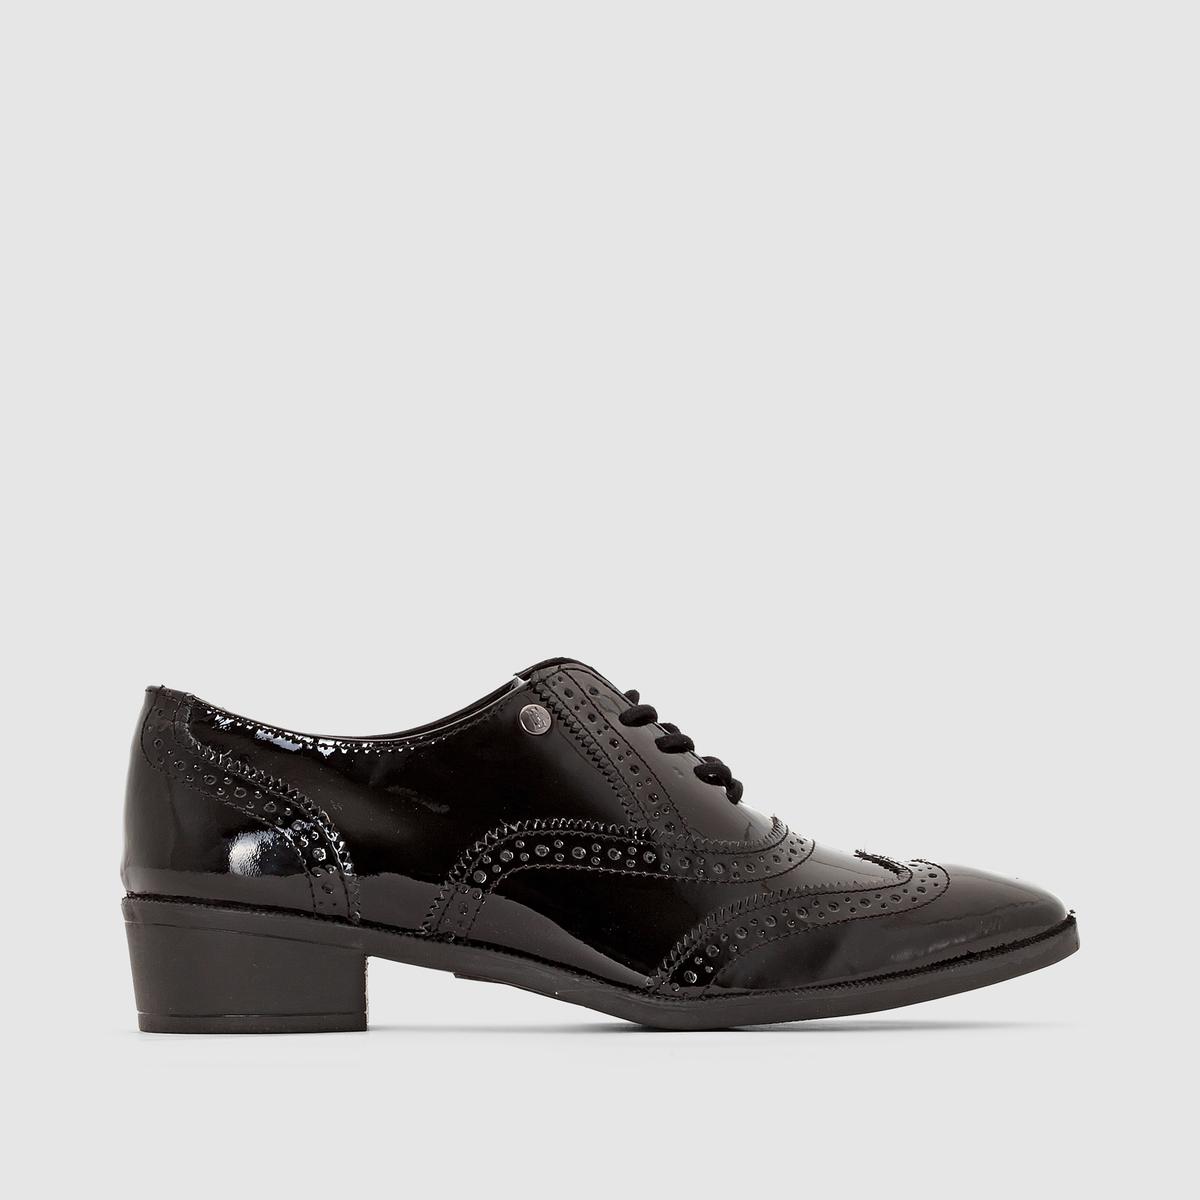 Ботинки-дерби на шнуровке от La Redoute